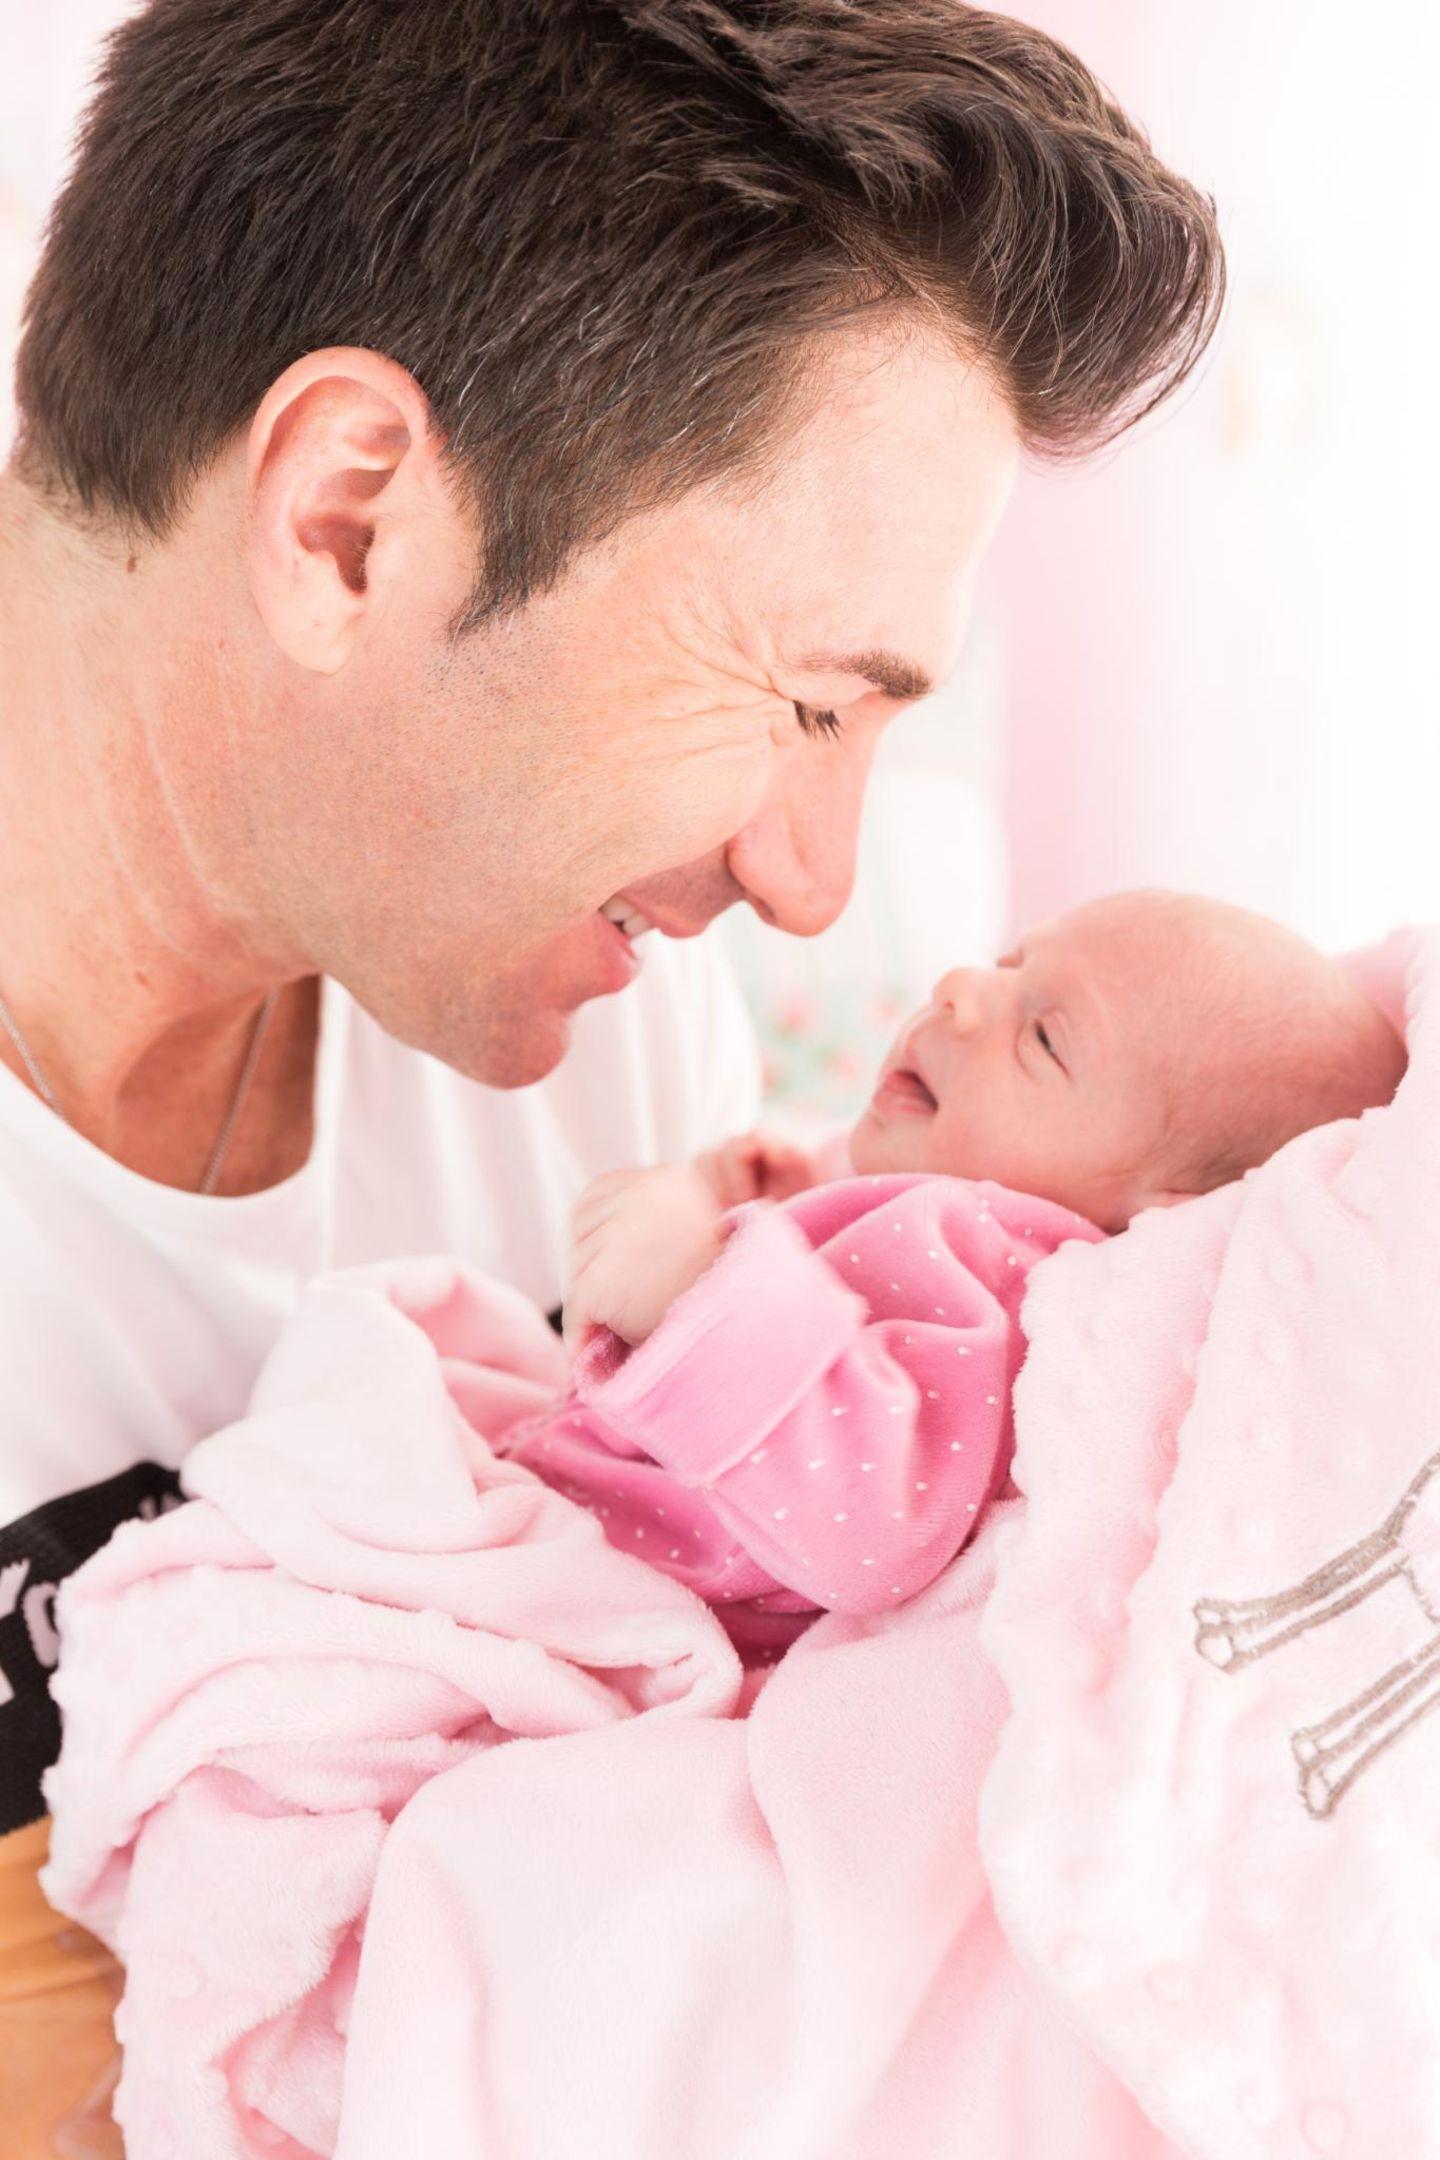 Vater Erkältet Baby Anstecken